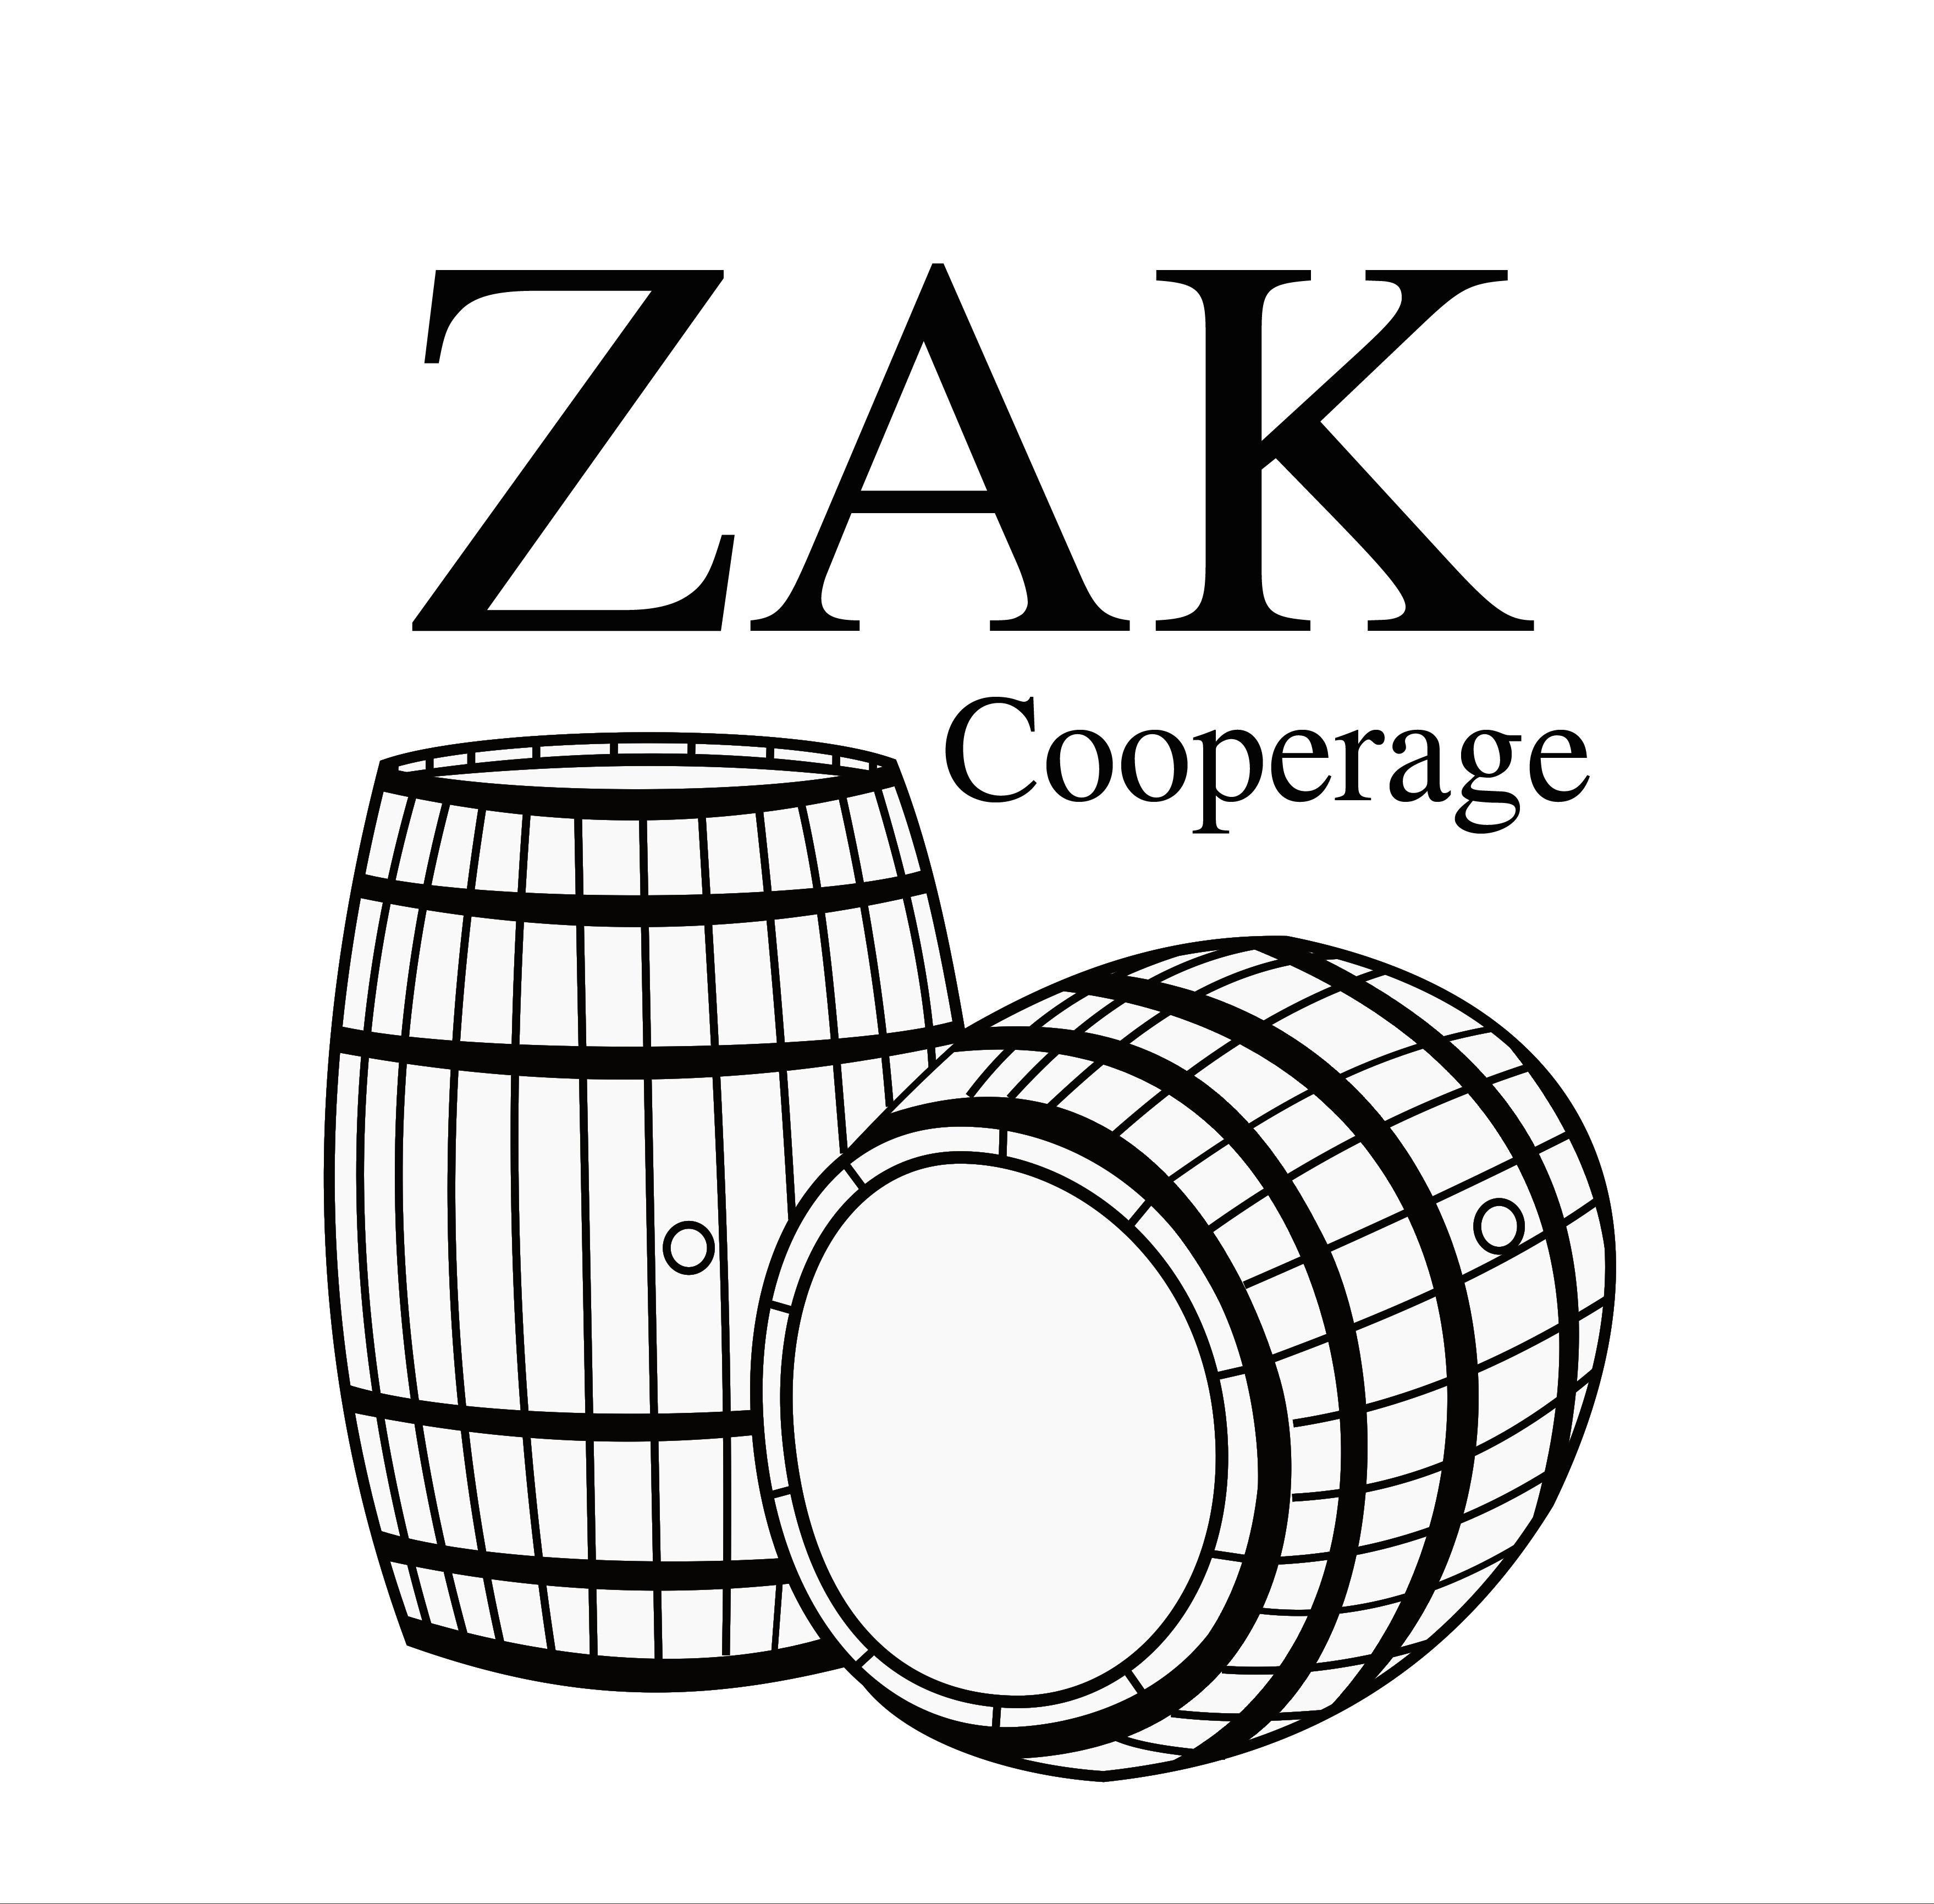 3517x3462 Zak Cooperage